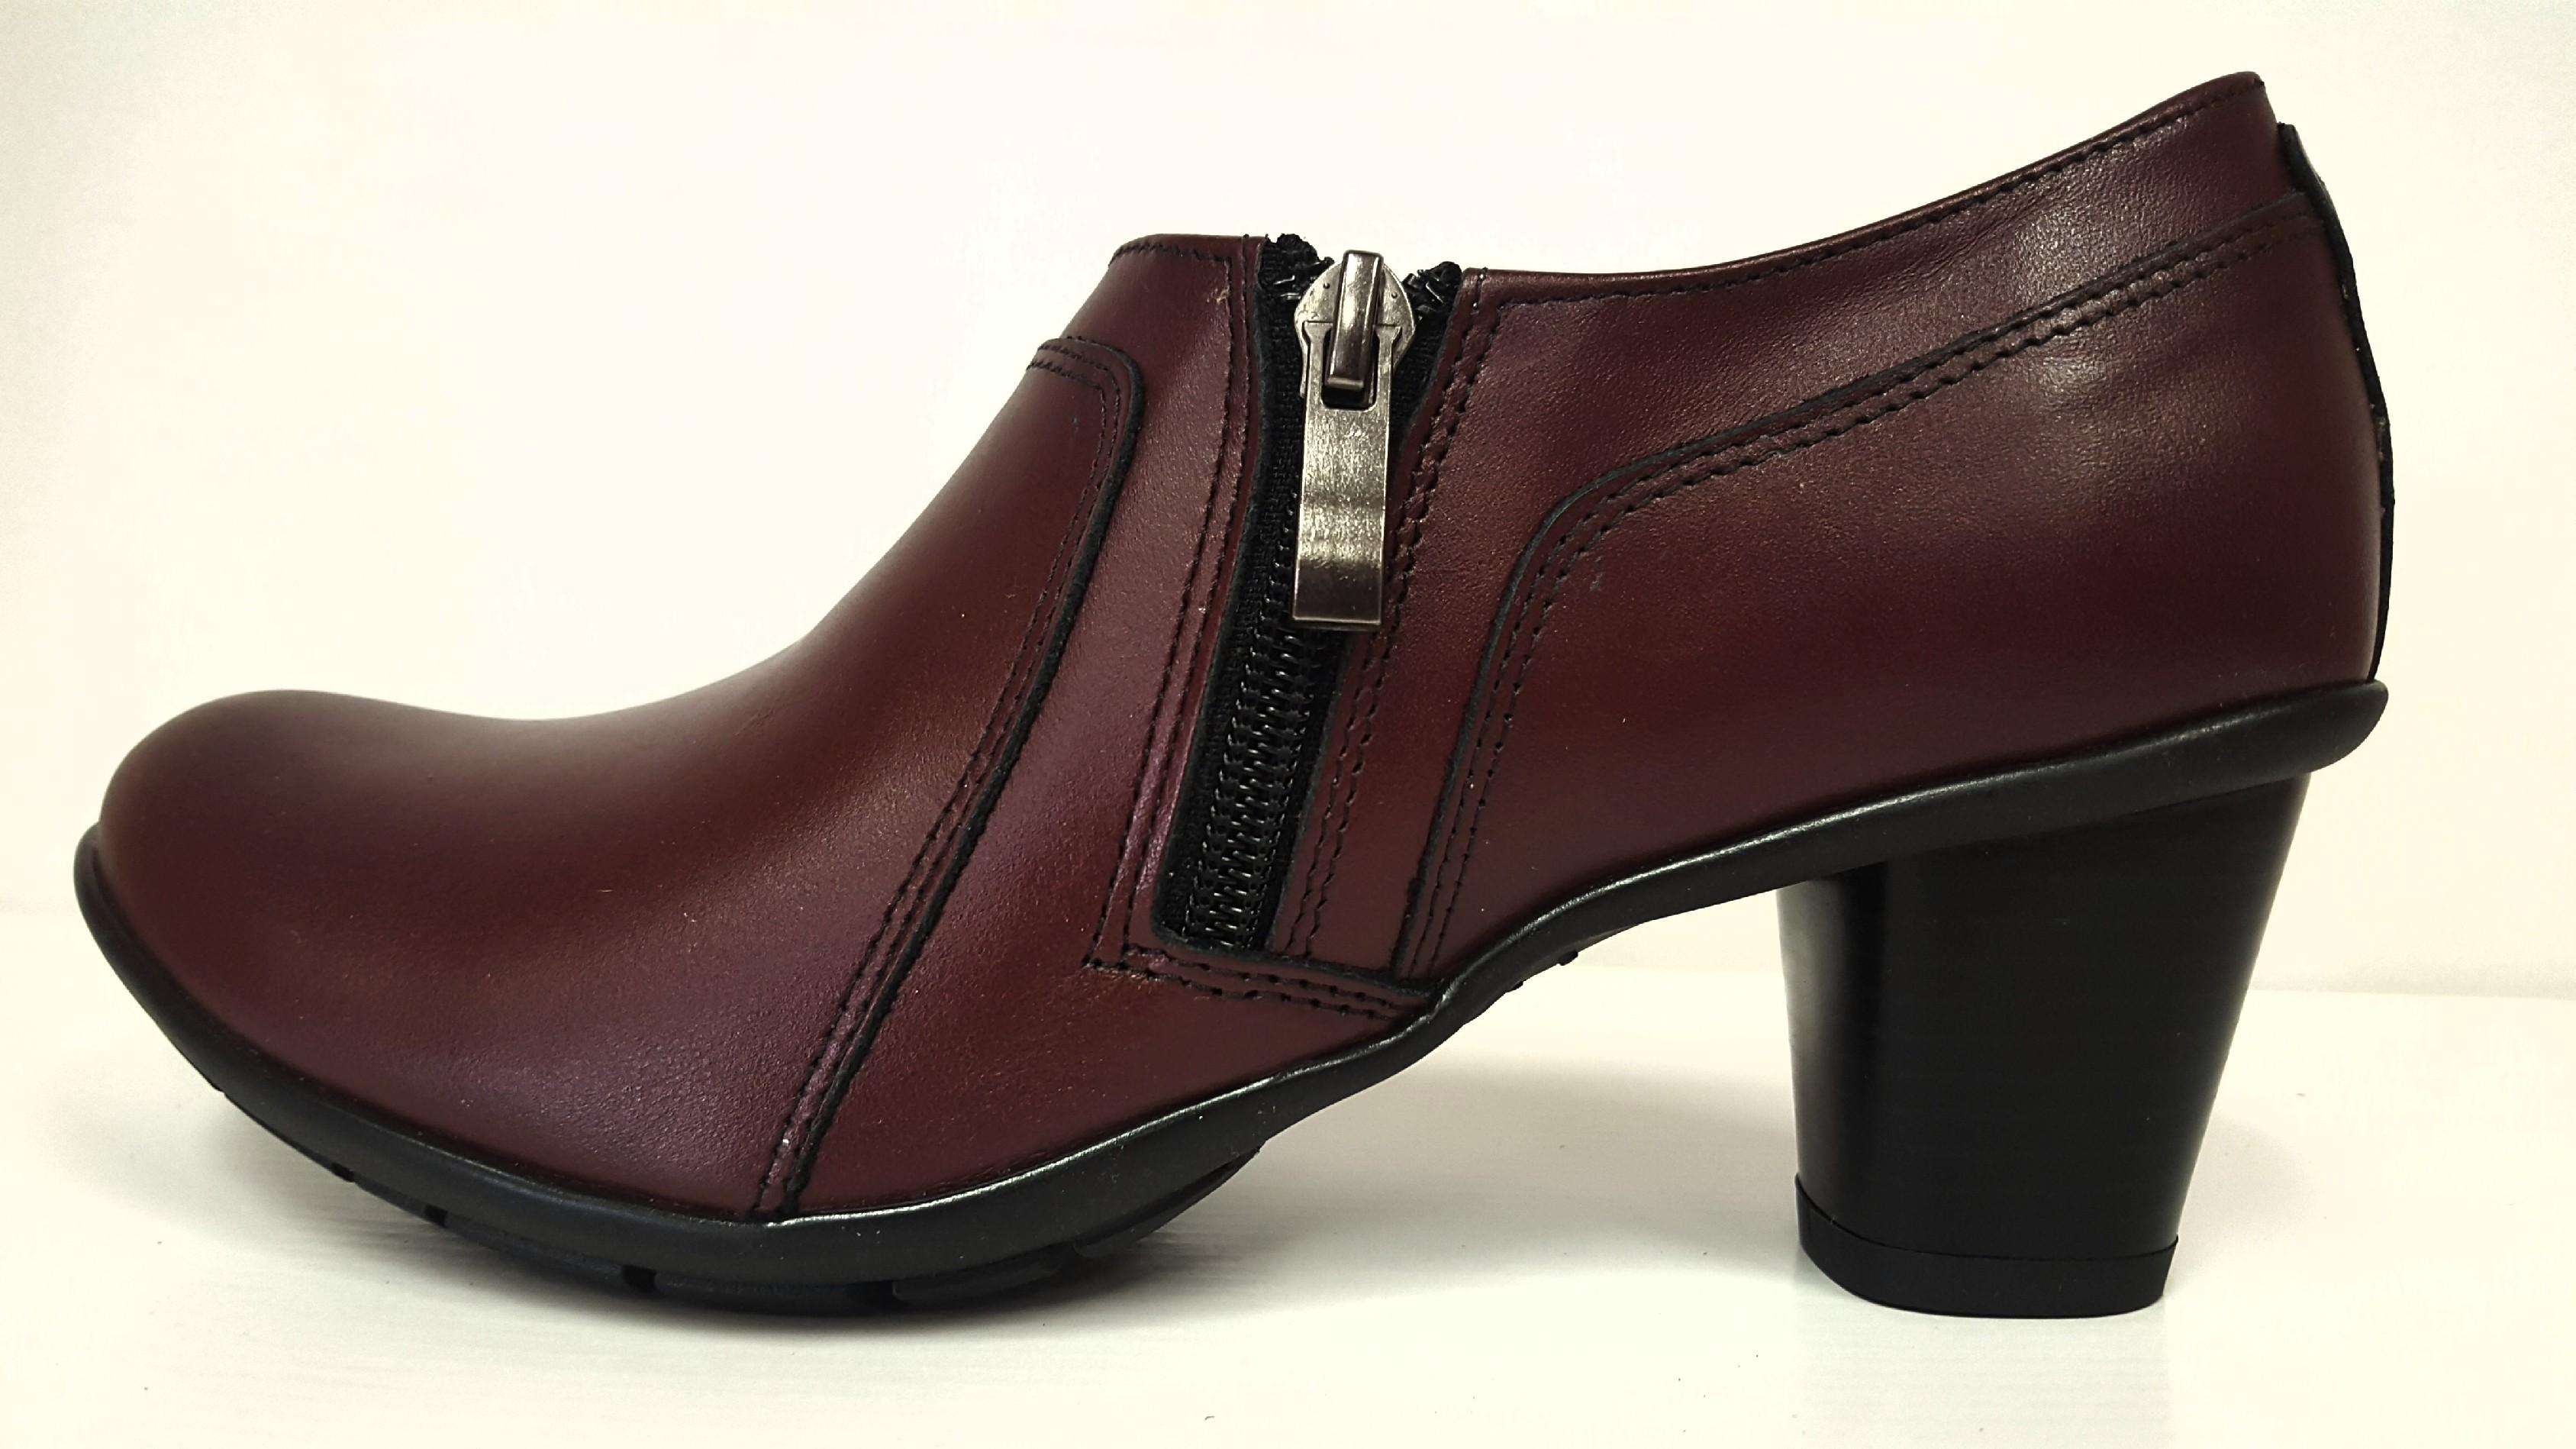 69cc0258b Dámské kožené bordo boty na podpatku Mintaka 32838 Tabulka dámských  velikostí: 40